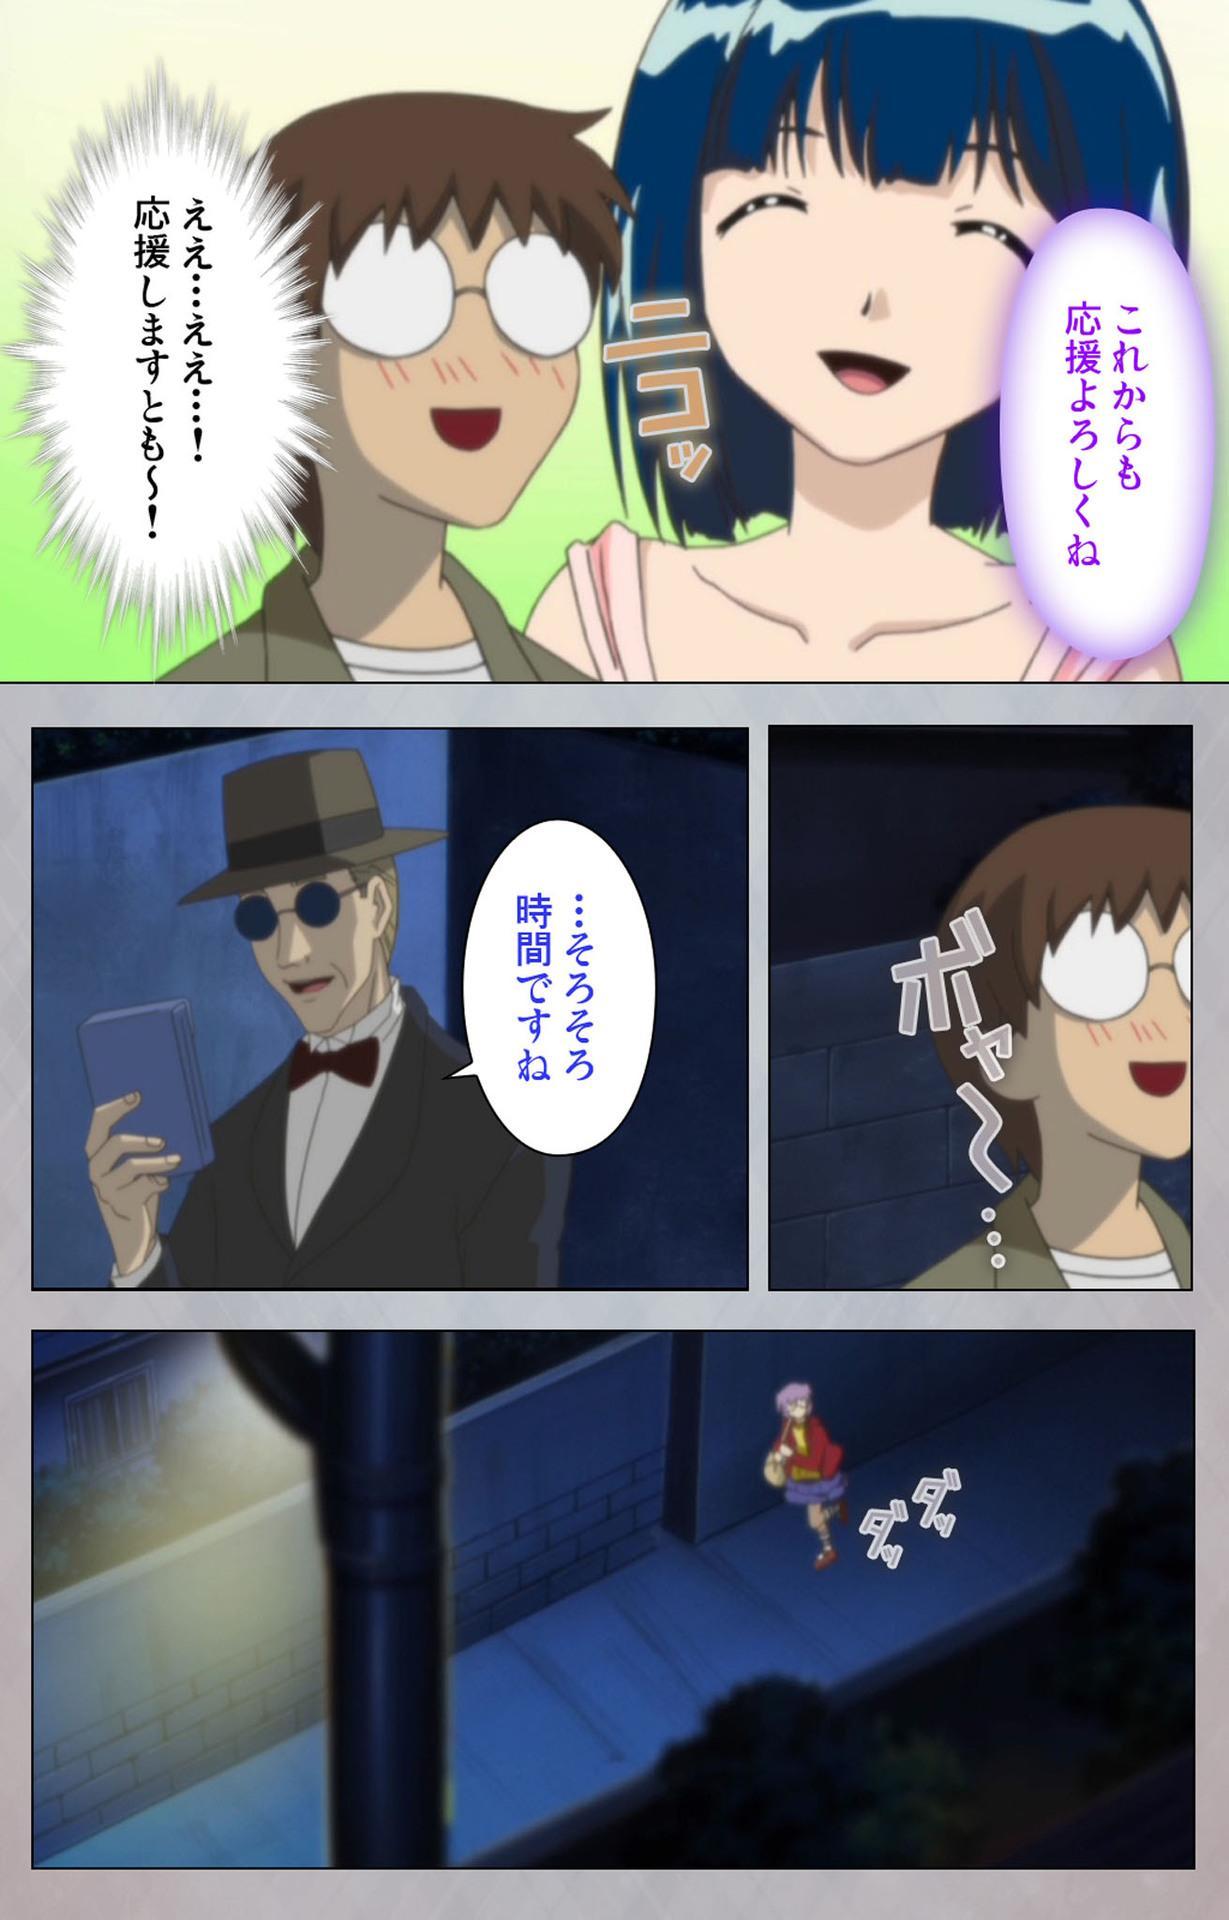 [Digital Works] [Full Color Seijin Ban] Sex Android ~Risou no Onna de Nuite yaru~ Kanzenban 14